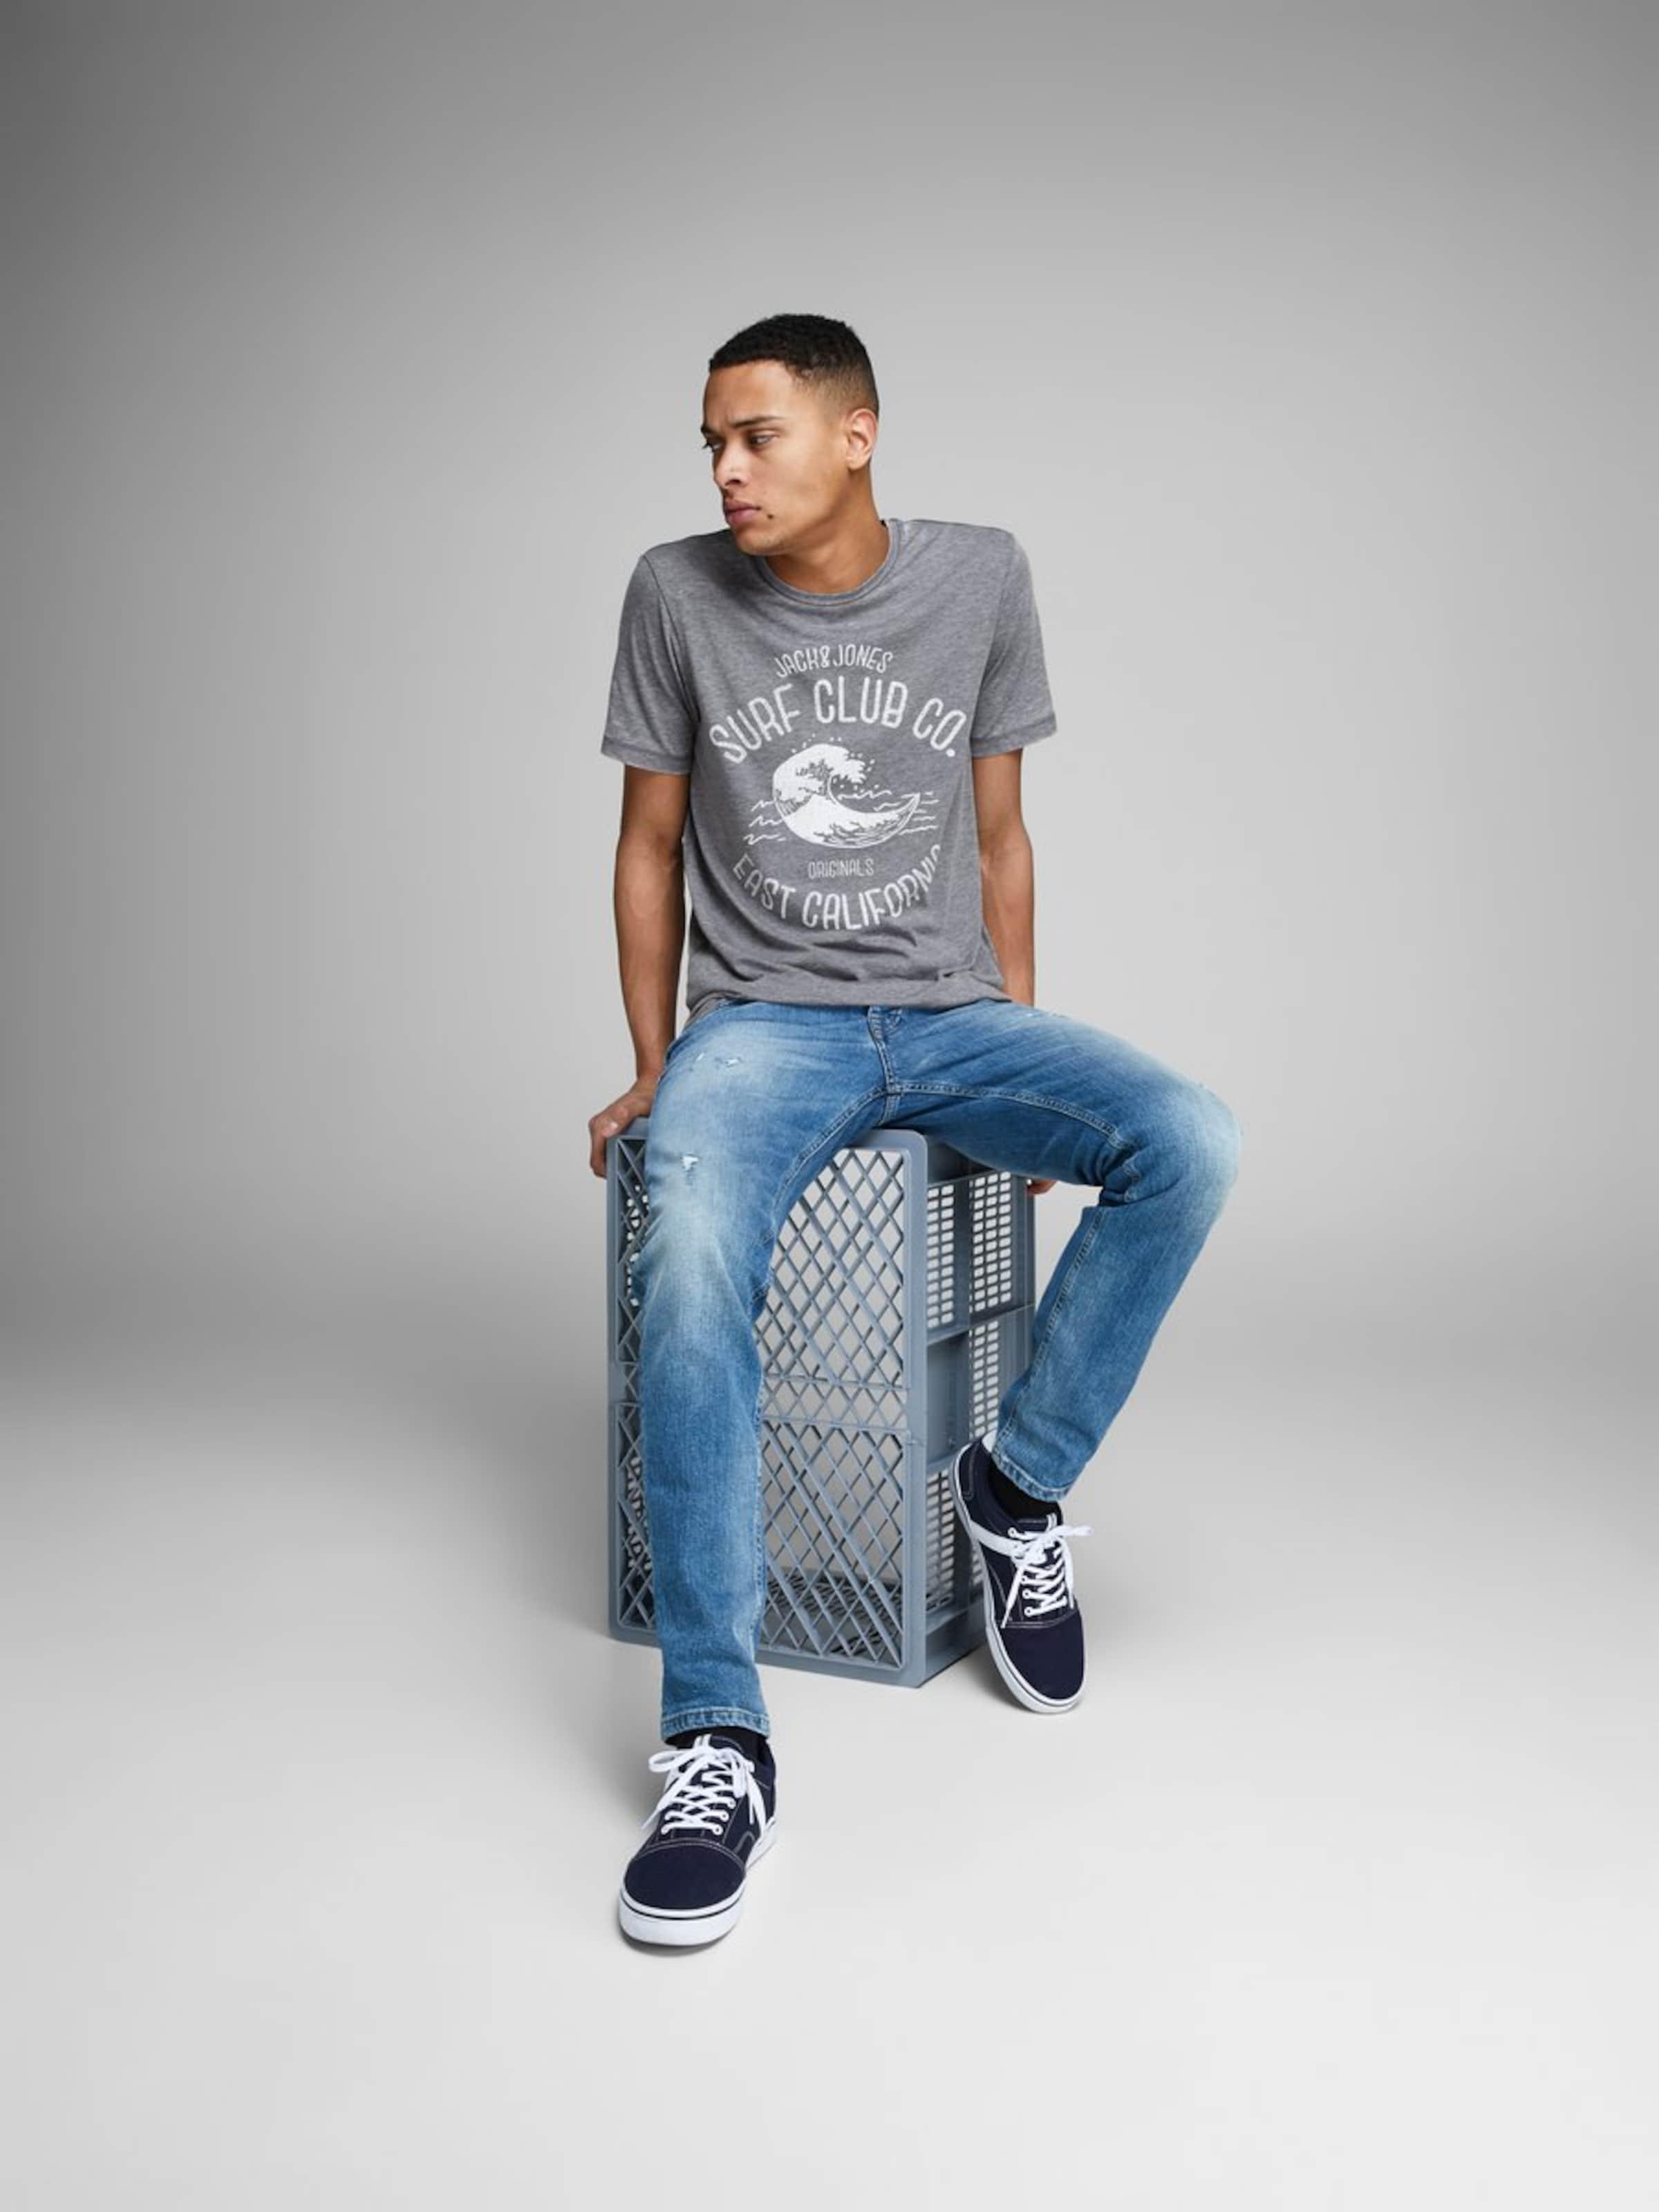 En Bleu T Jackamp; Jones shirt PXOlwuZiTk